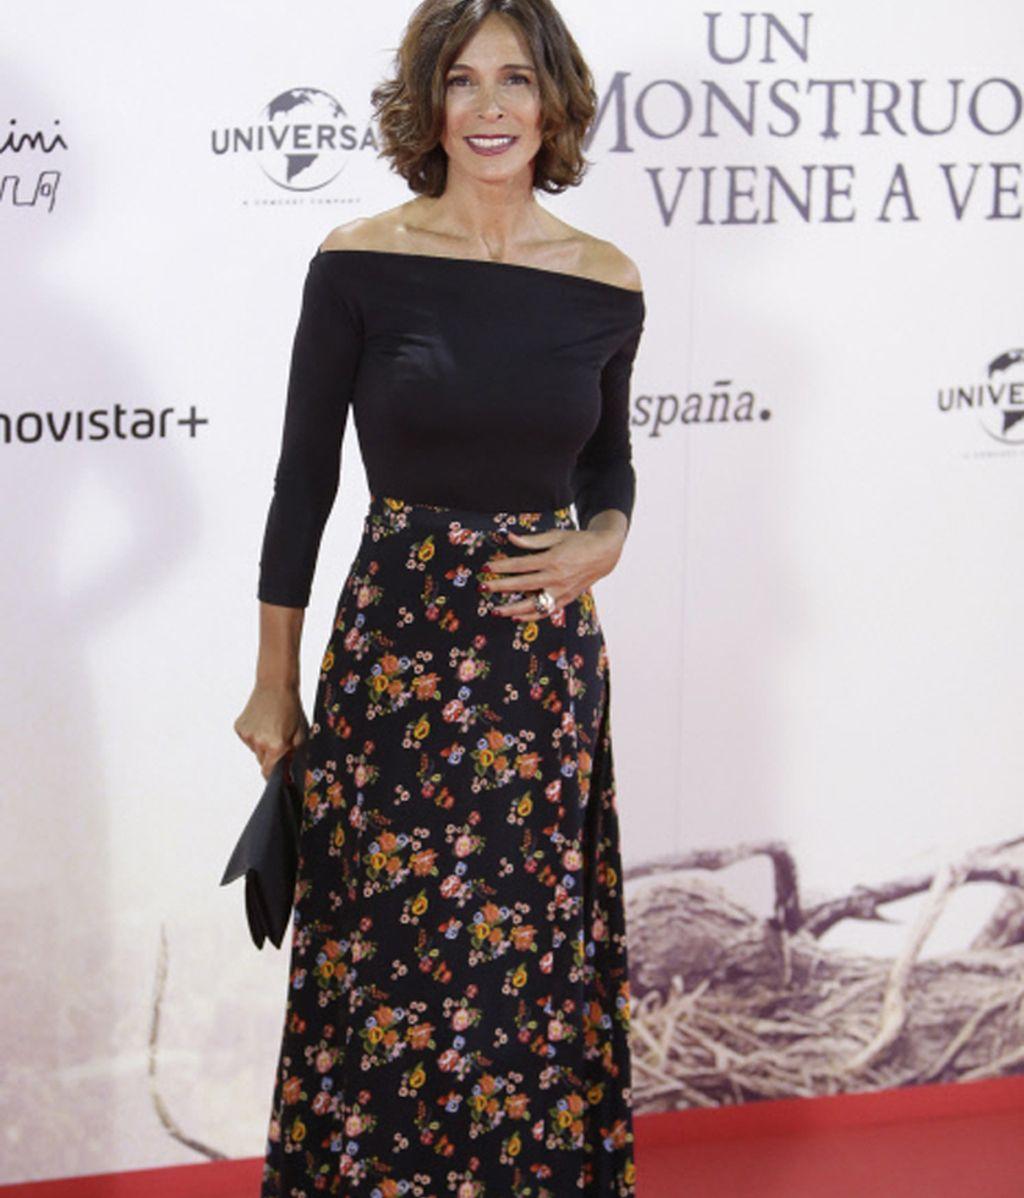 Lidia Bosch